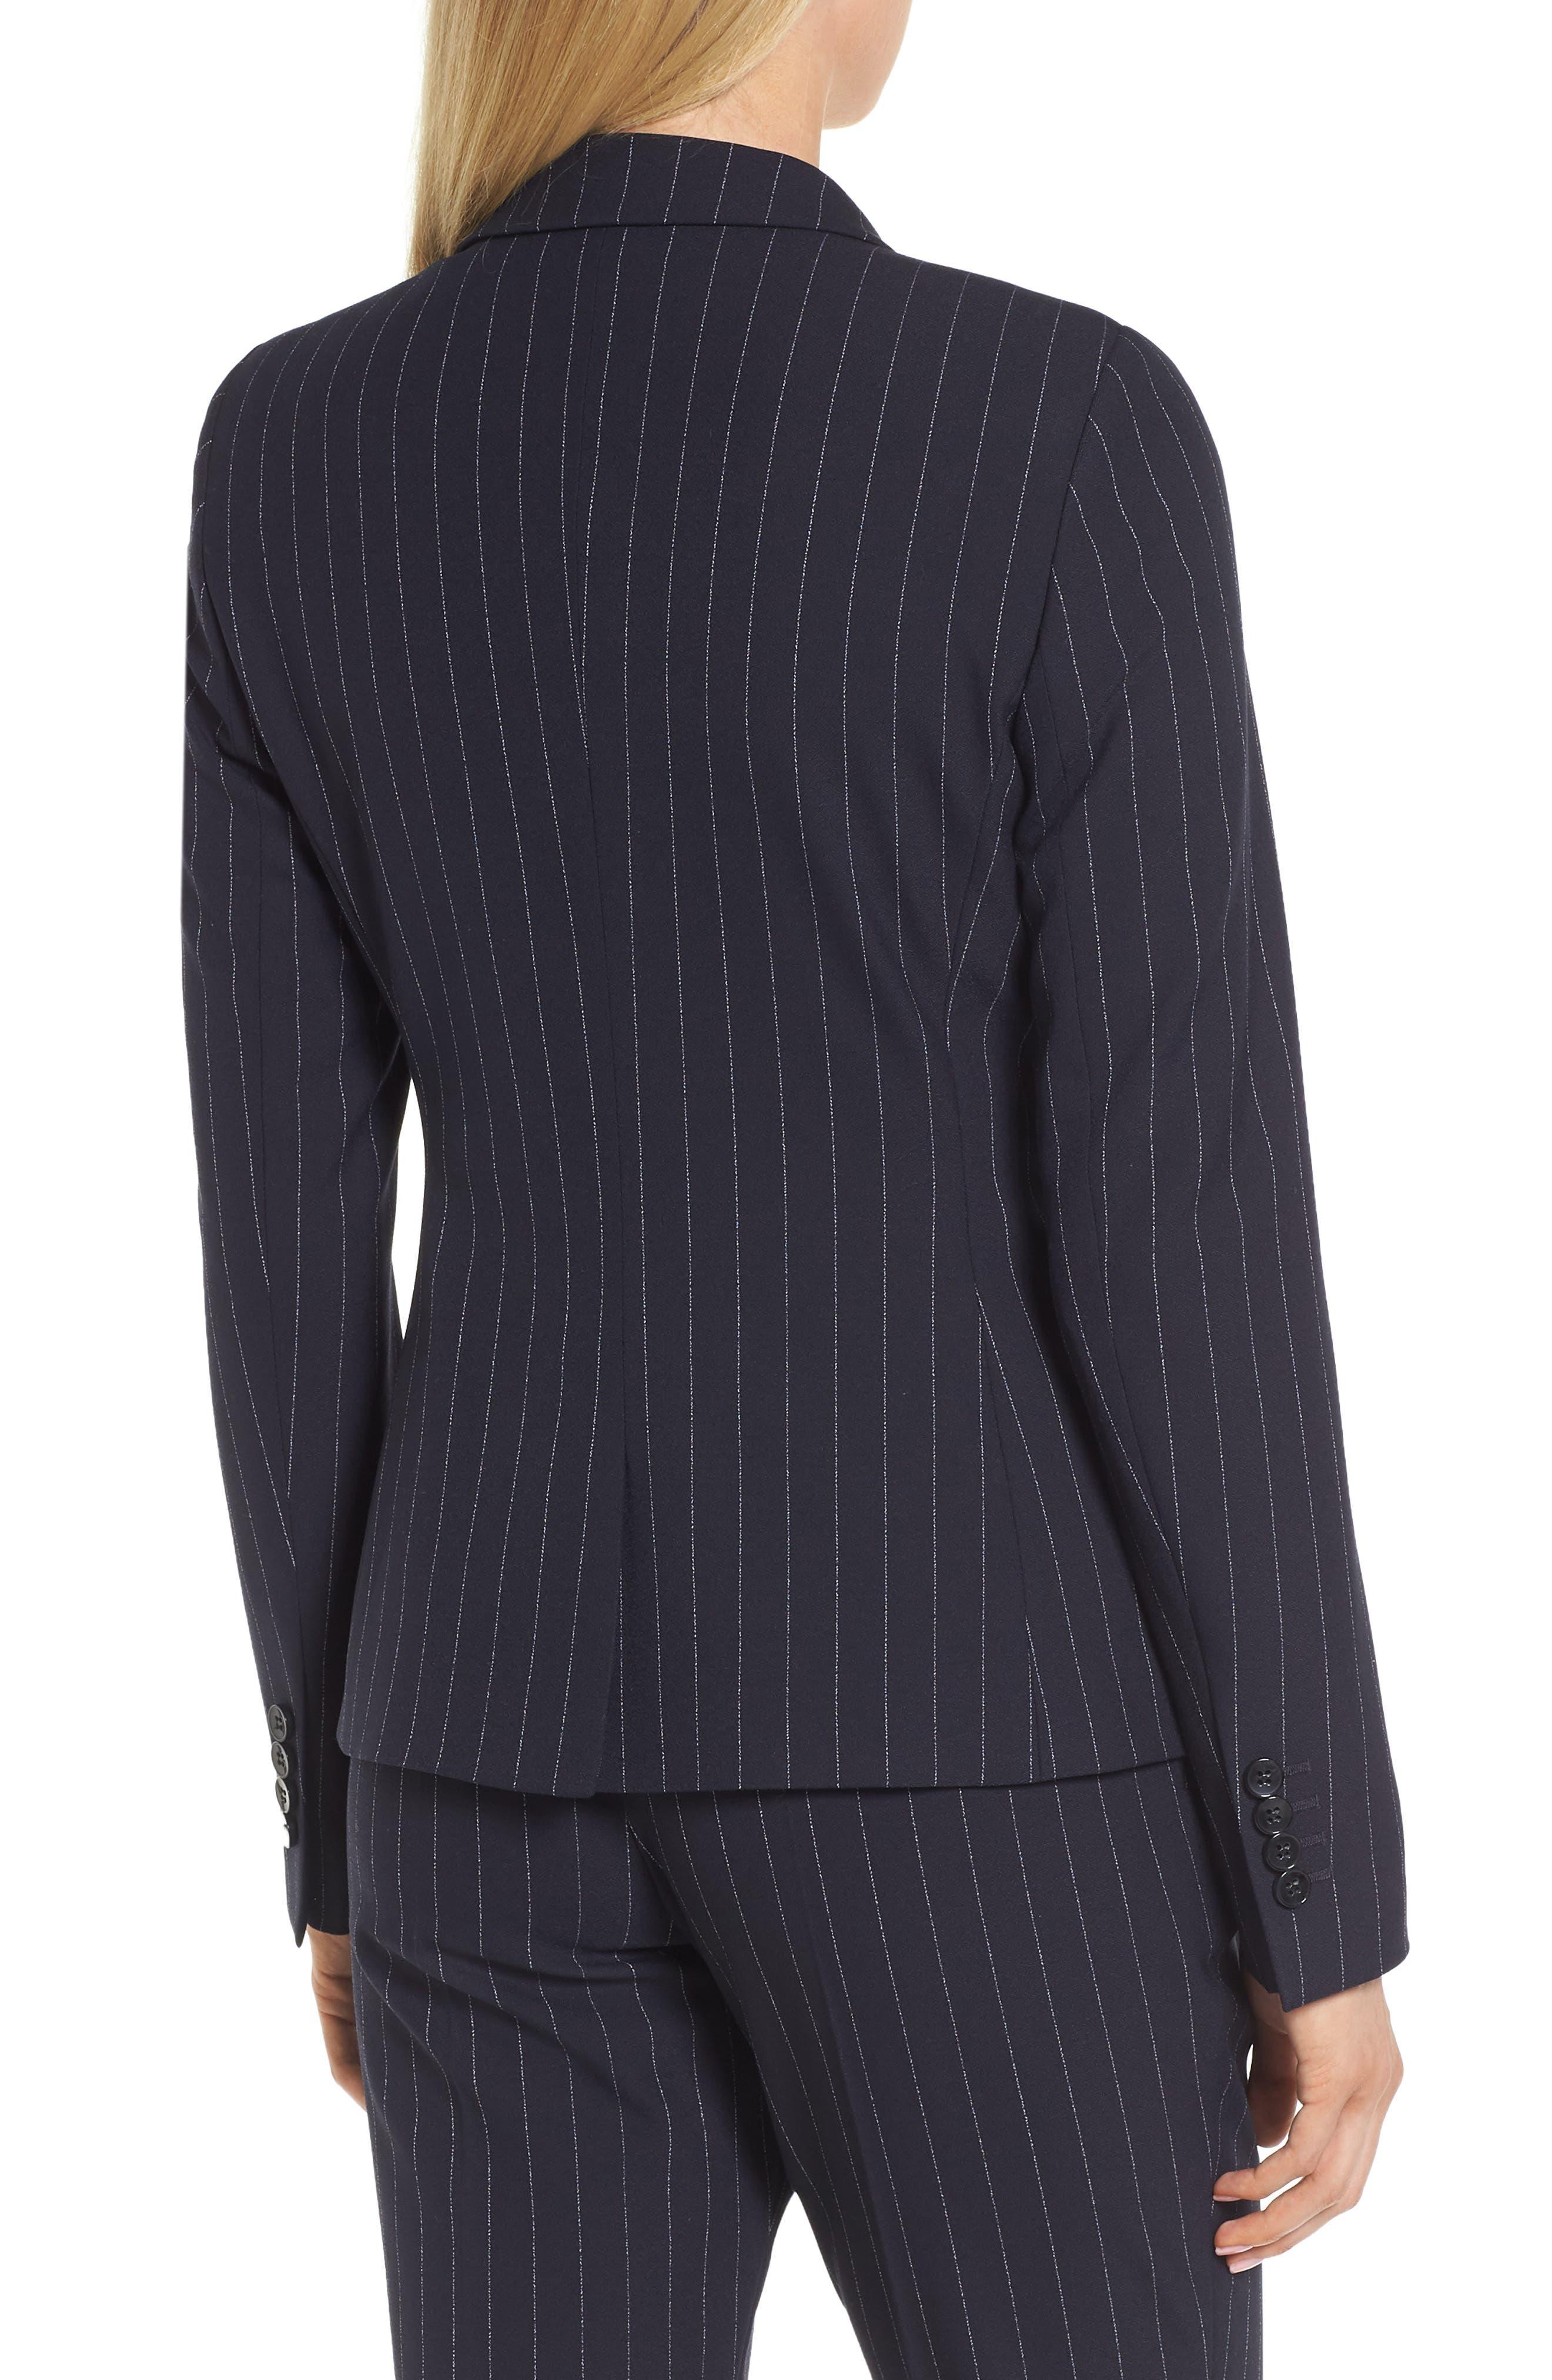 Jelaya Double Breasted Suit Jacket,                             Alternate thumbnail 2, color,                             Navy Fantasy